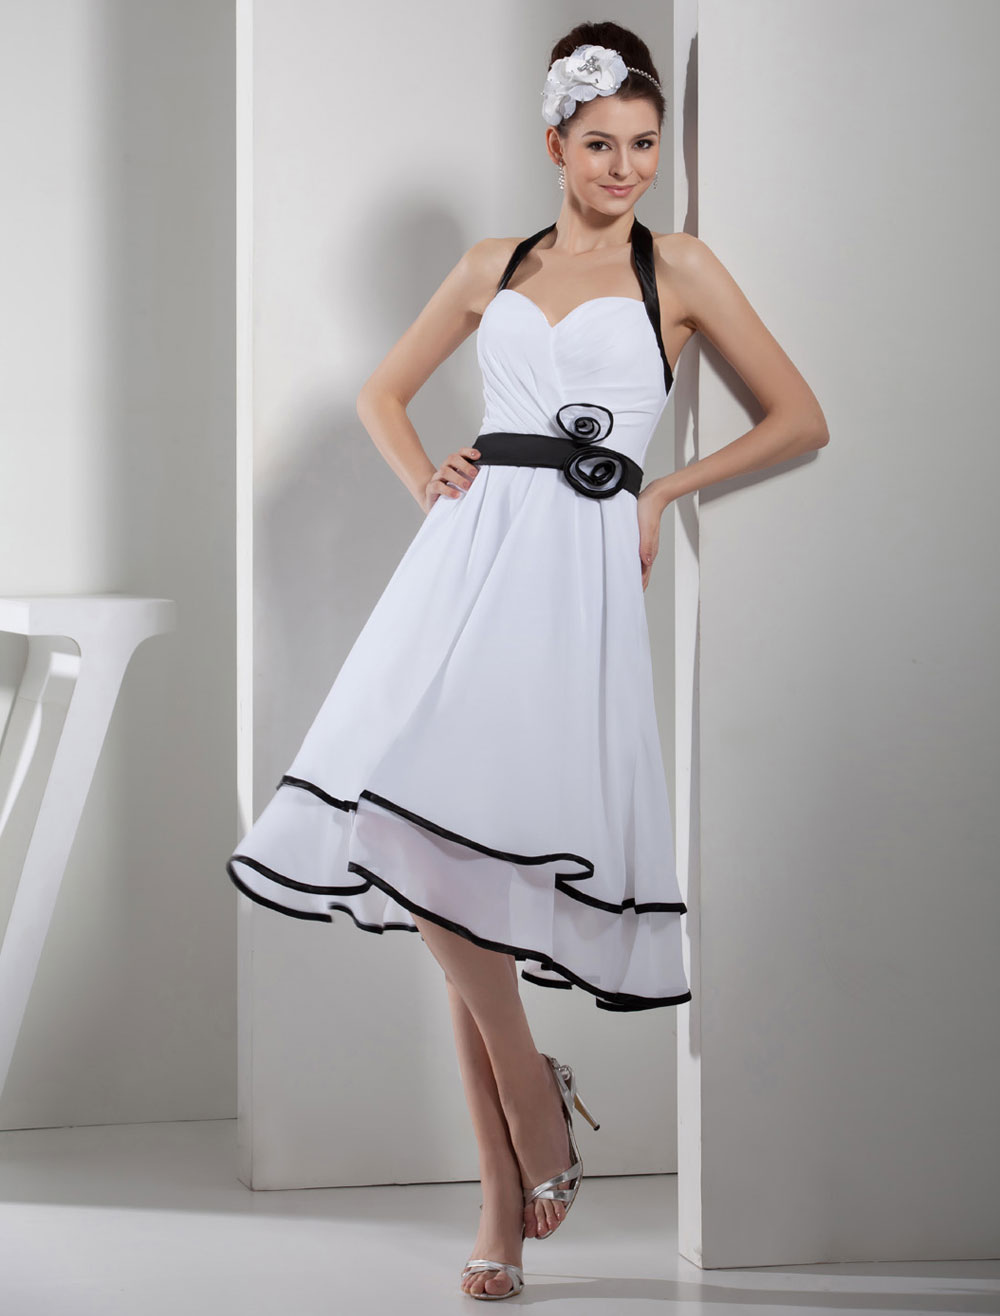 Halter Homecoming Dress Pleated Flower Applique Chiffon A-Line Backless Cocktail Dress Short Prom Dress Milanoo